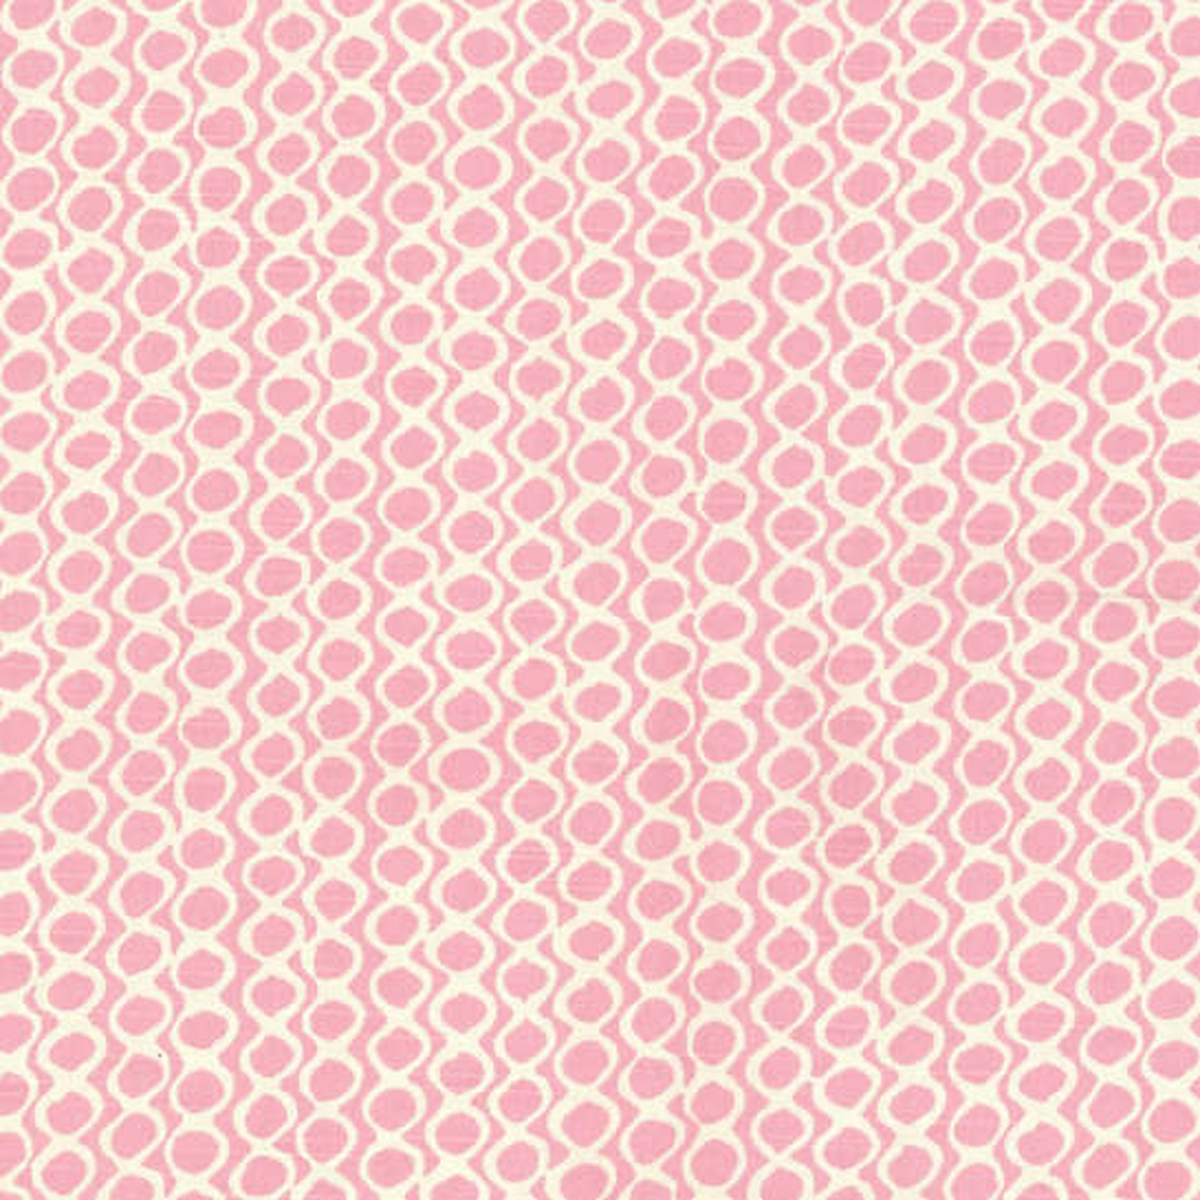 Beads Pink Fabric